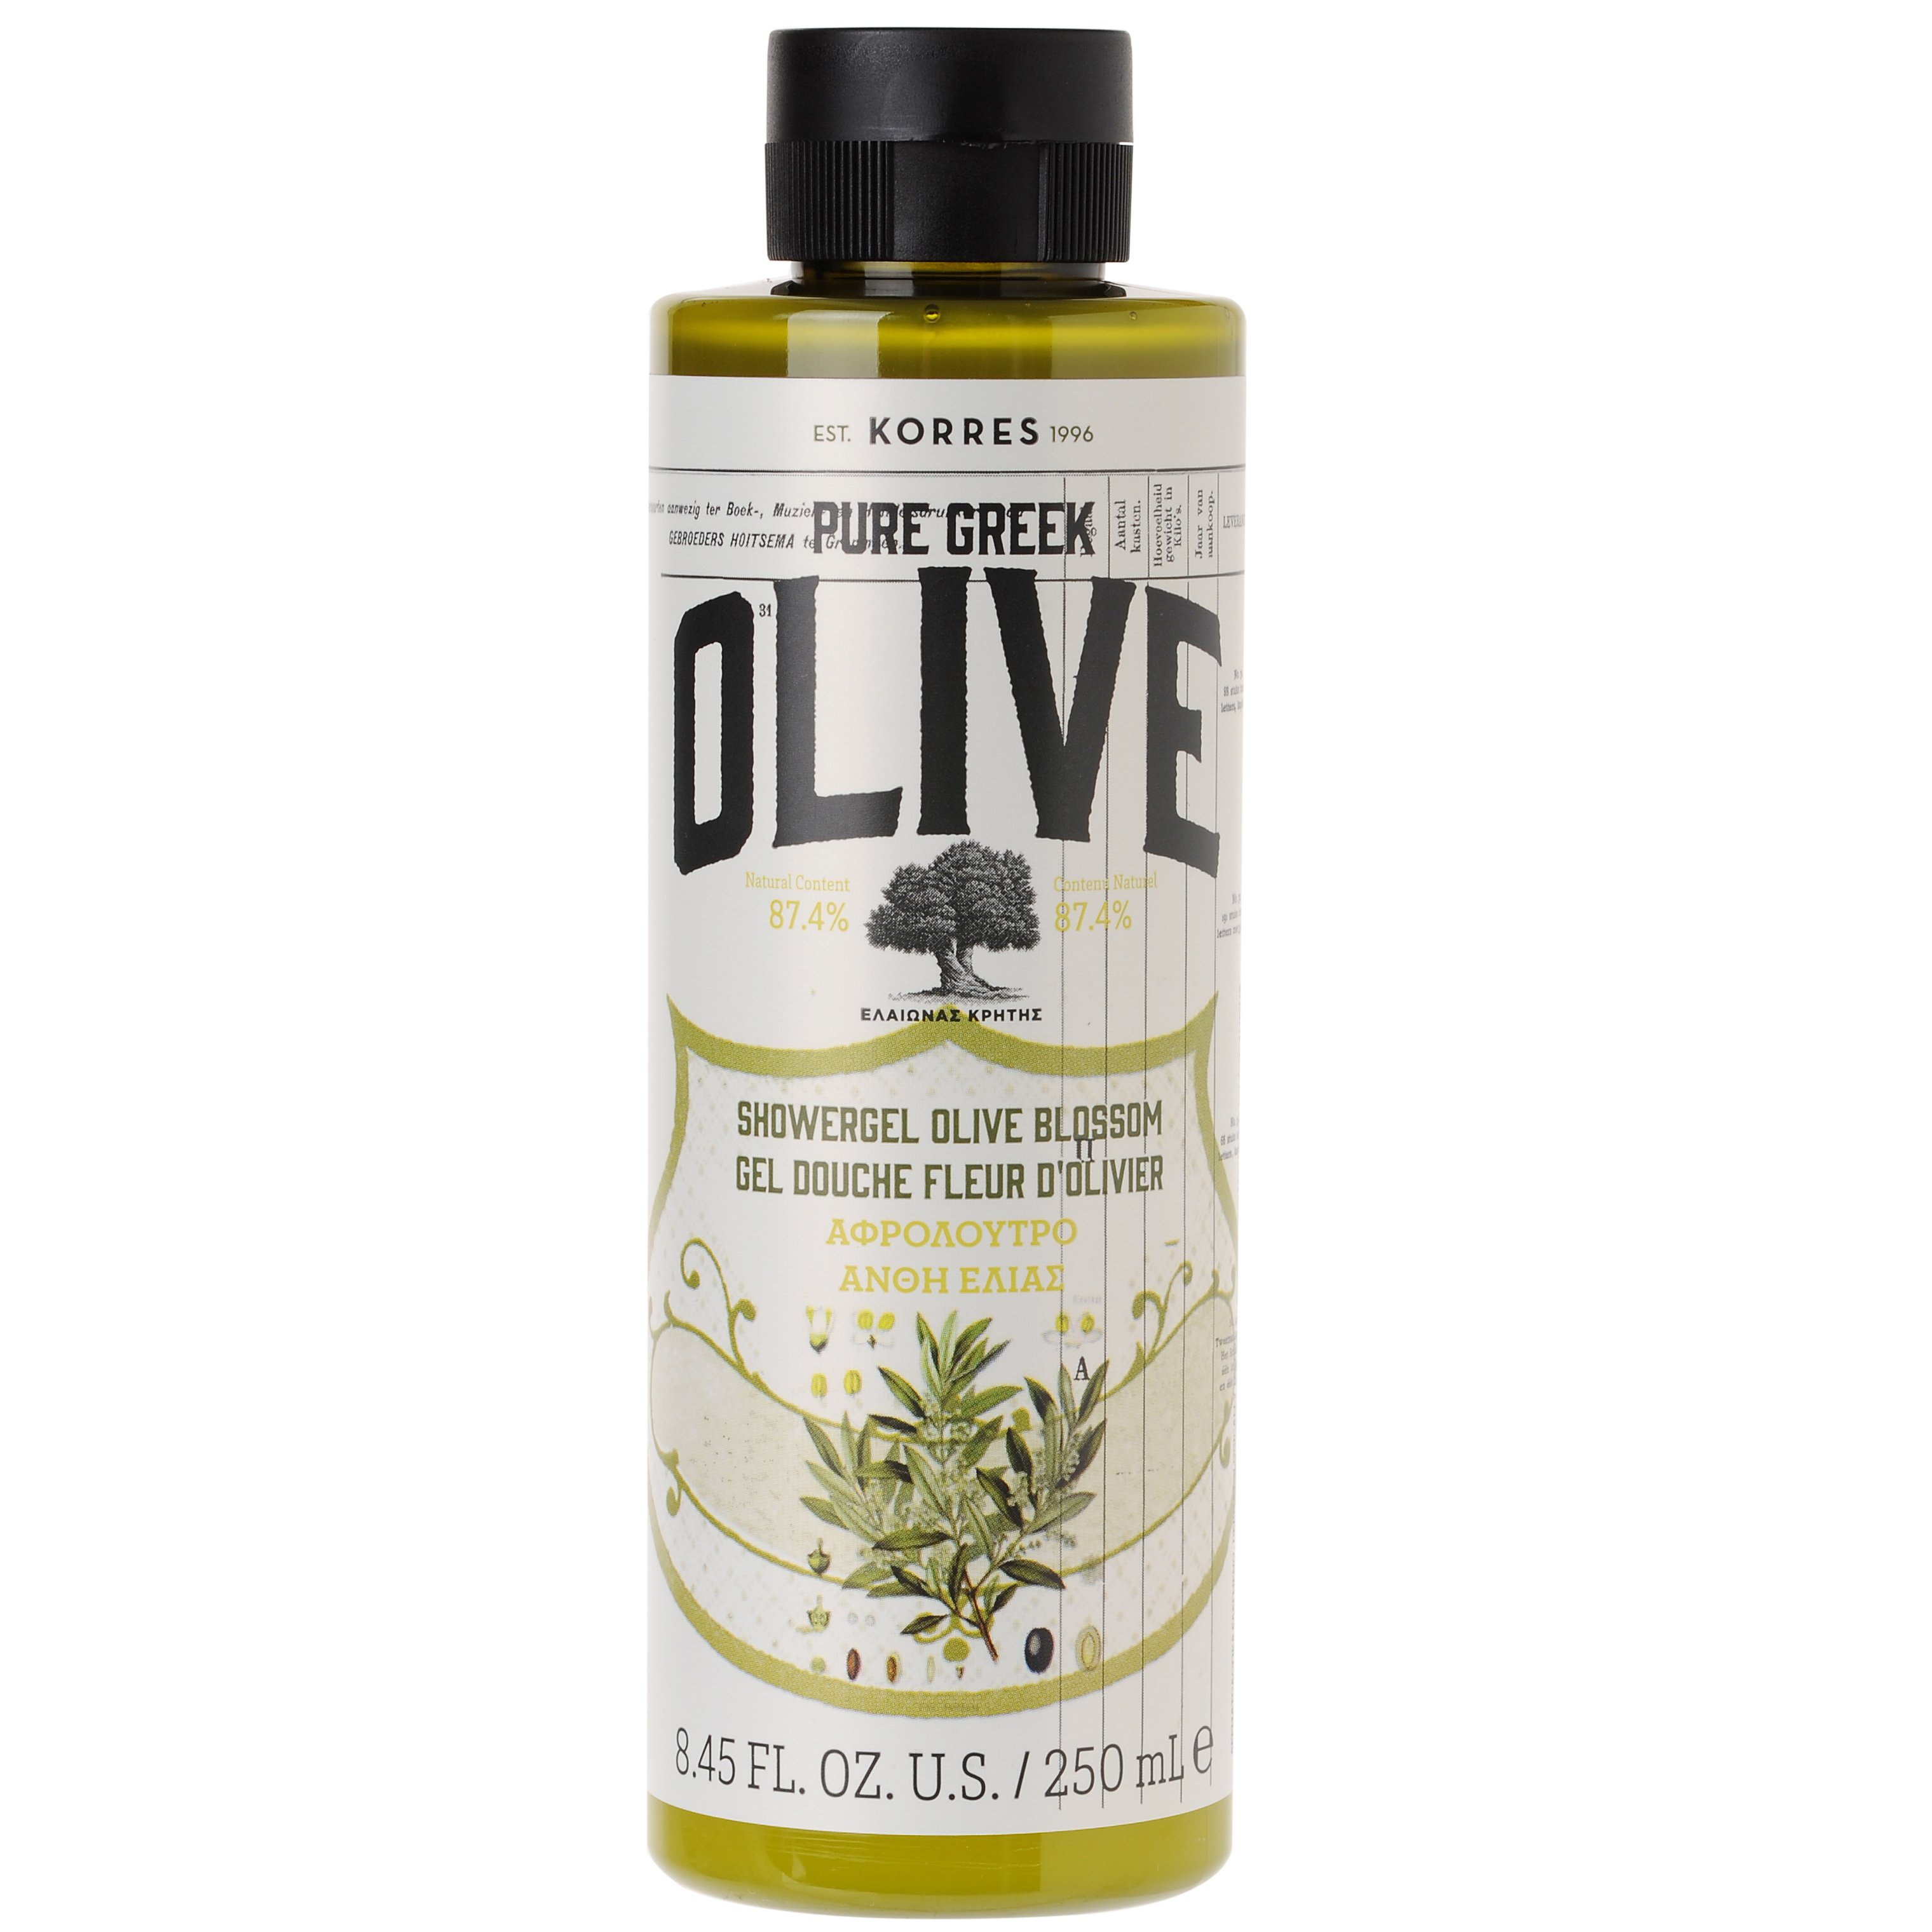 Korres Pure Greek Olive Shower Gel Olive Blossom Αφρόλουτρο με Τονωτικό Εκχύλισμα ΑπόΆνθη Ελιάς 250ml